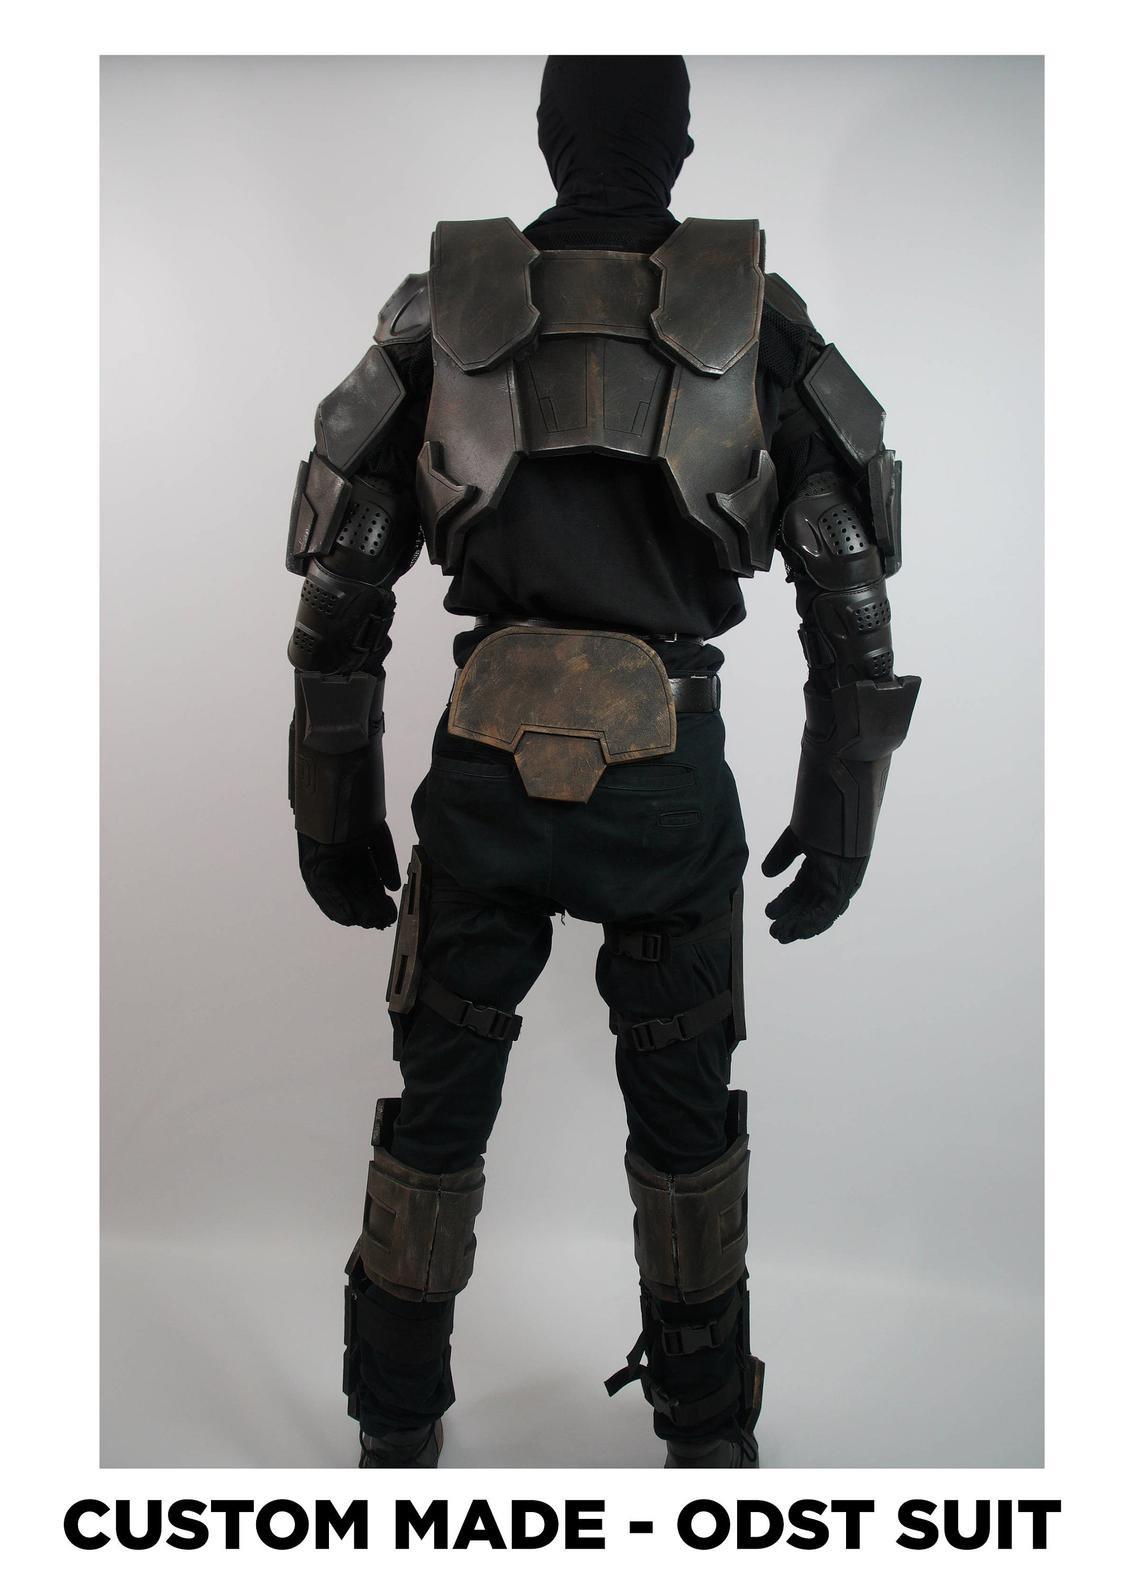 Full ODST Armor - Halo Cosplay EVA Foam Armor